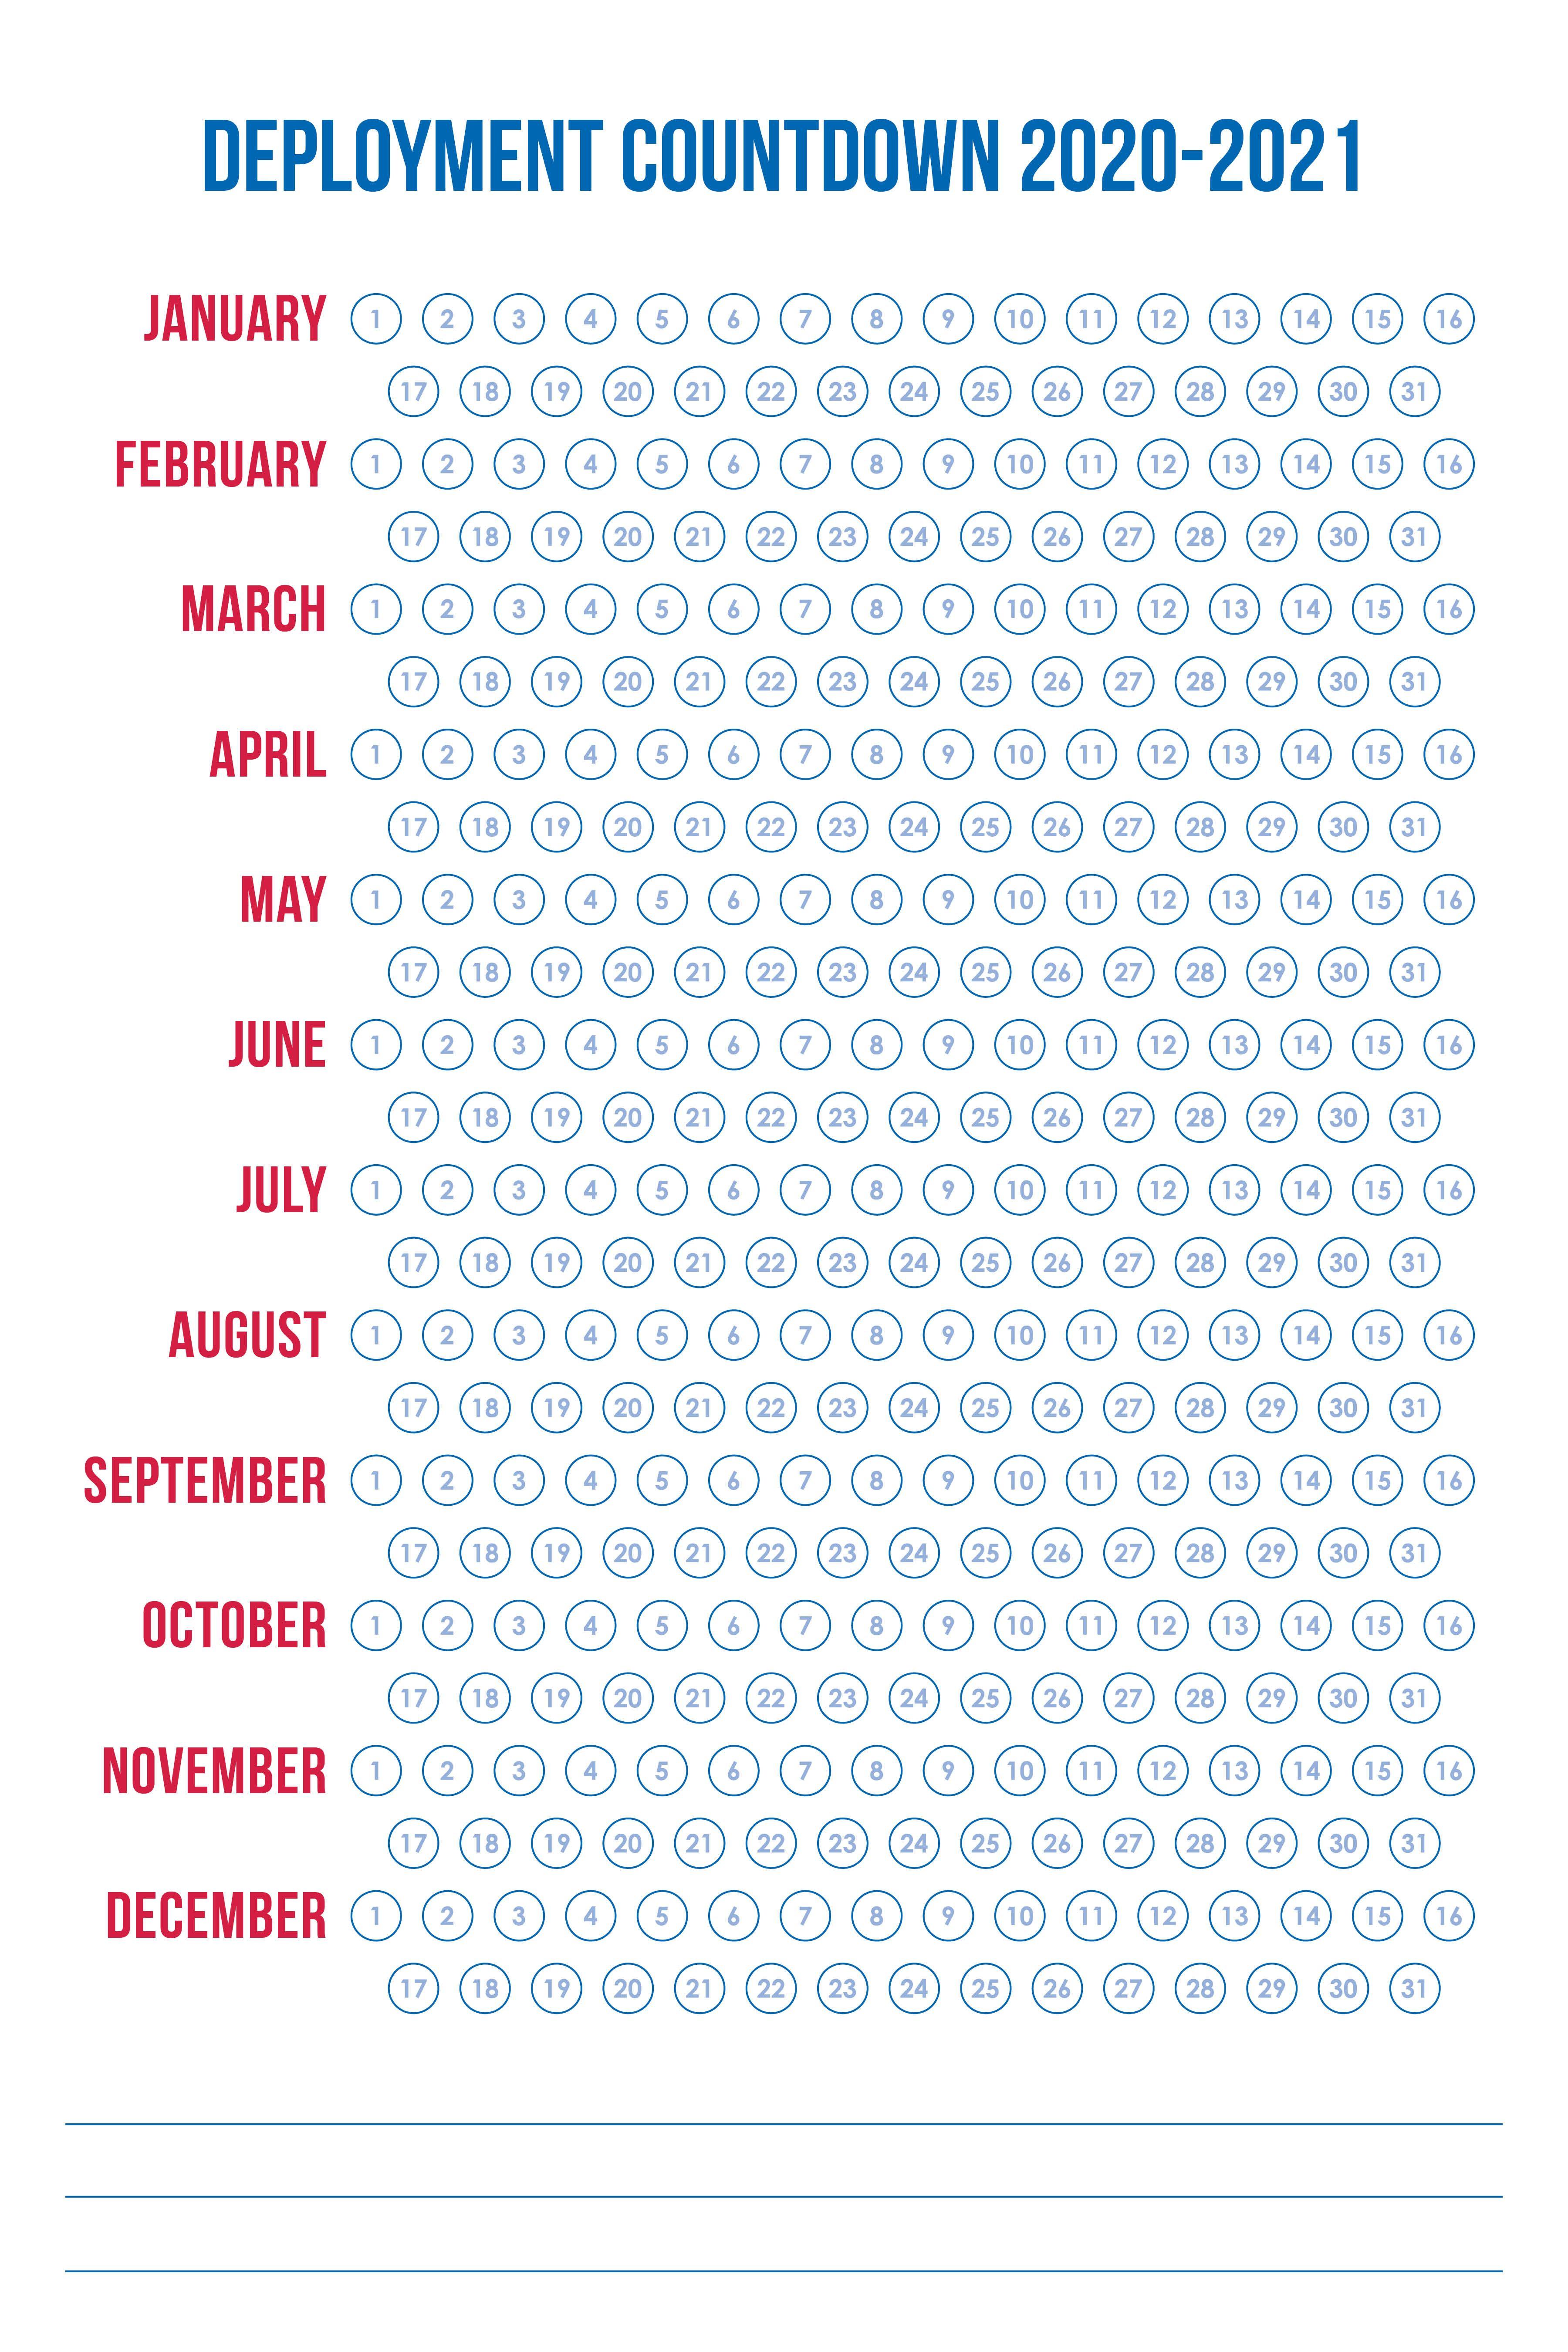 Countdown Print In 2020 Deployment Countdown Deployment Kids Countdown Calendar